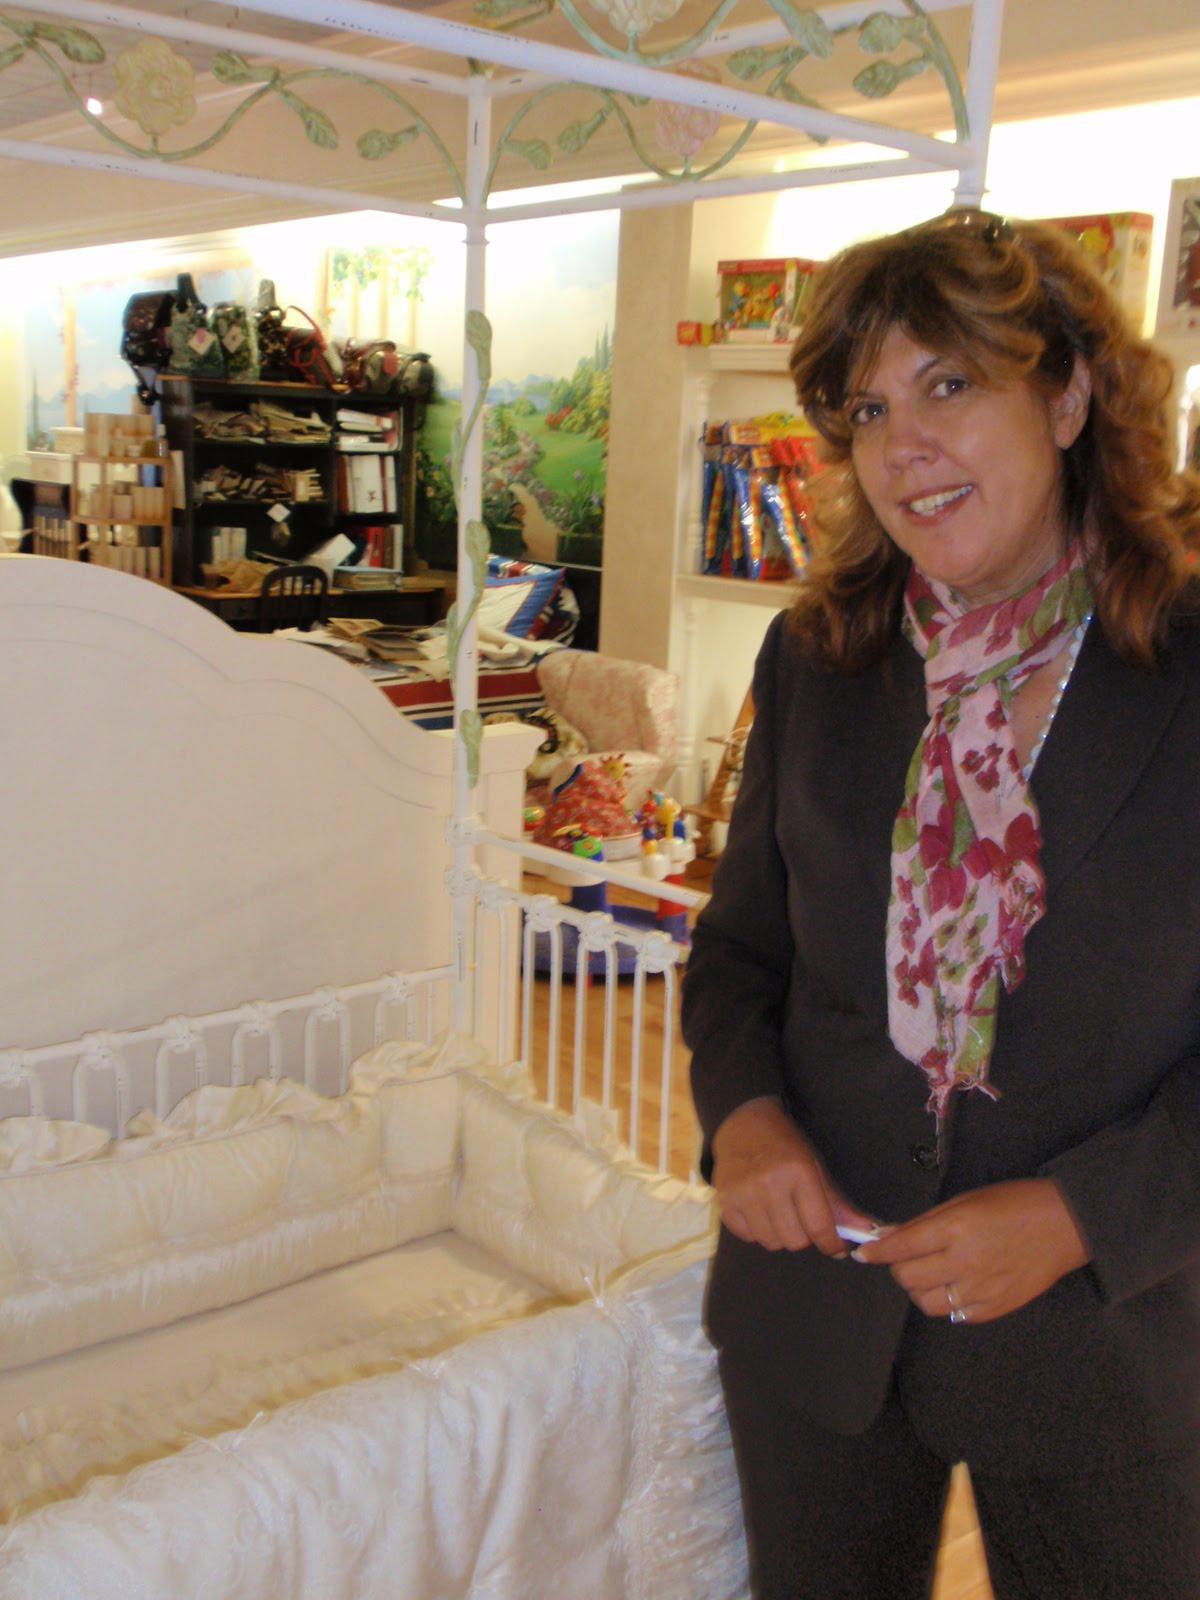 Designer Baby Bedding By Nava S Designs Petite Pram